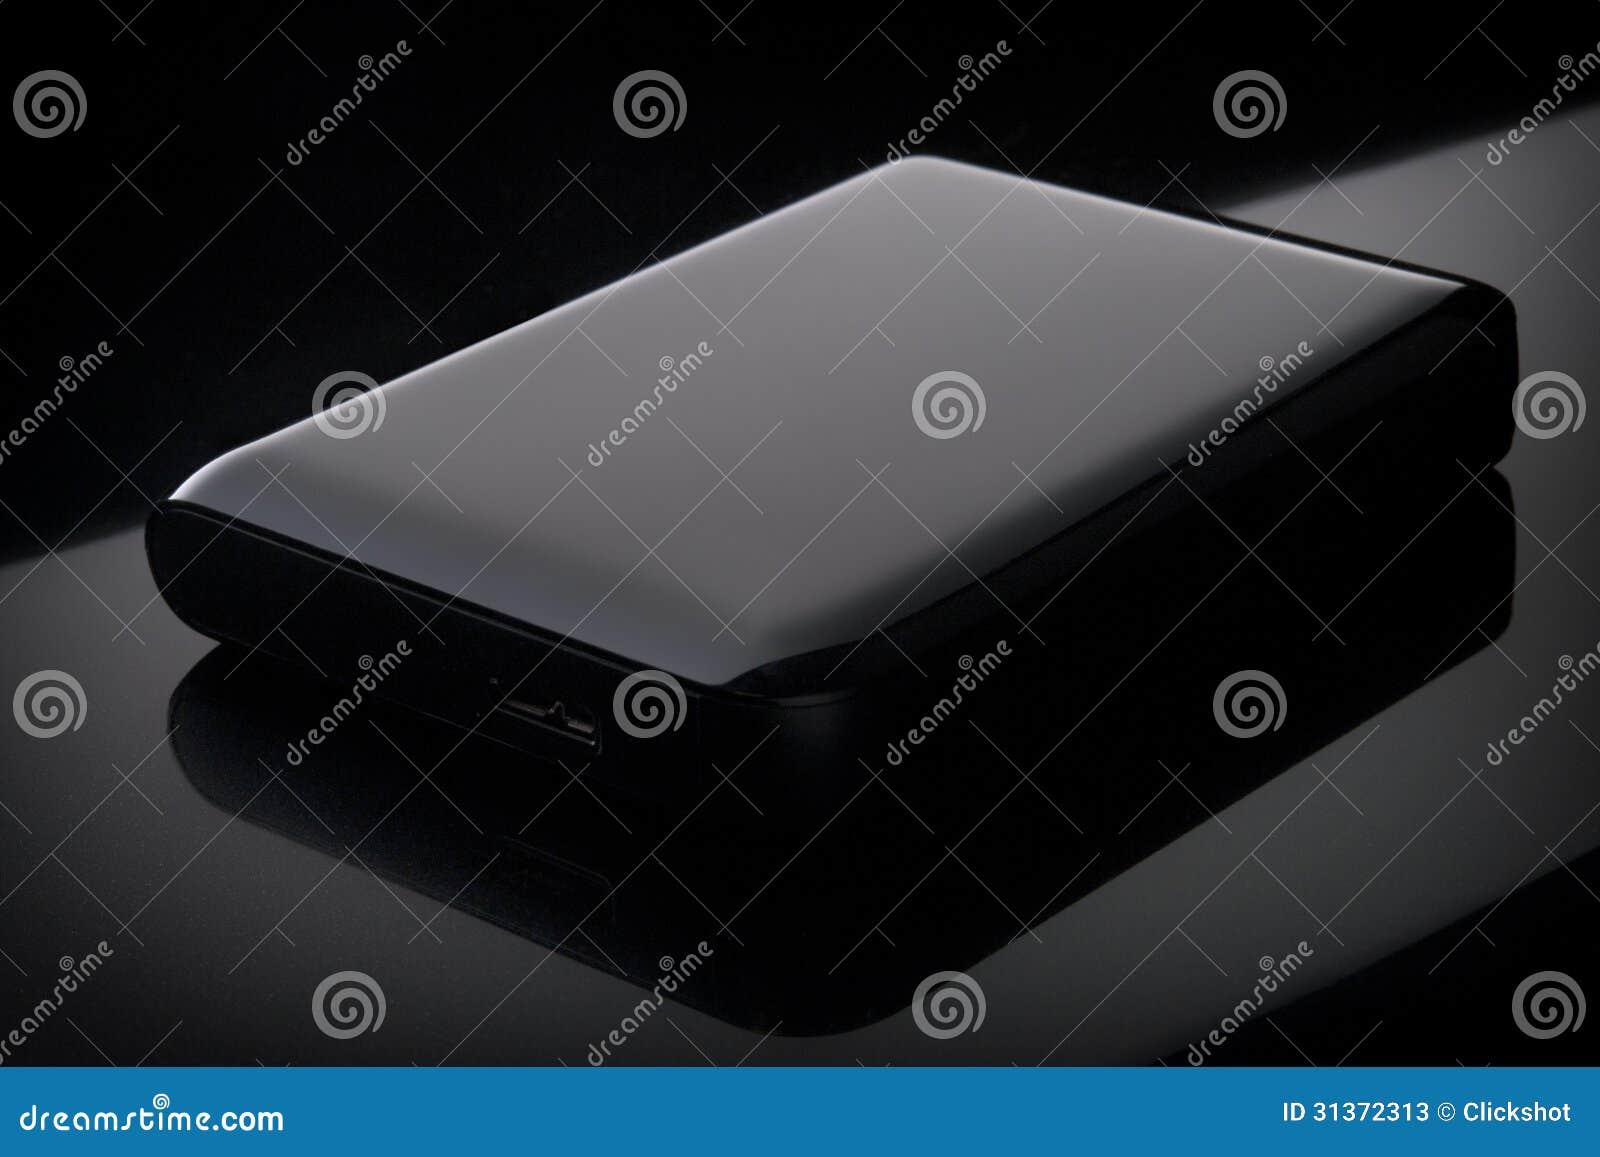 Glossy Portable External Hard Drive Stock Photos Image